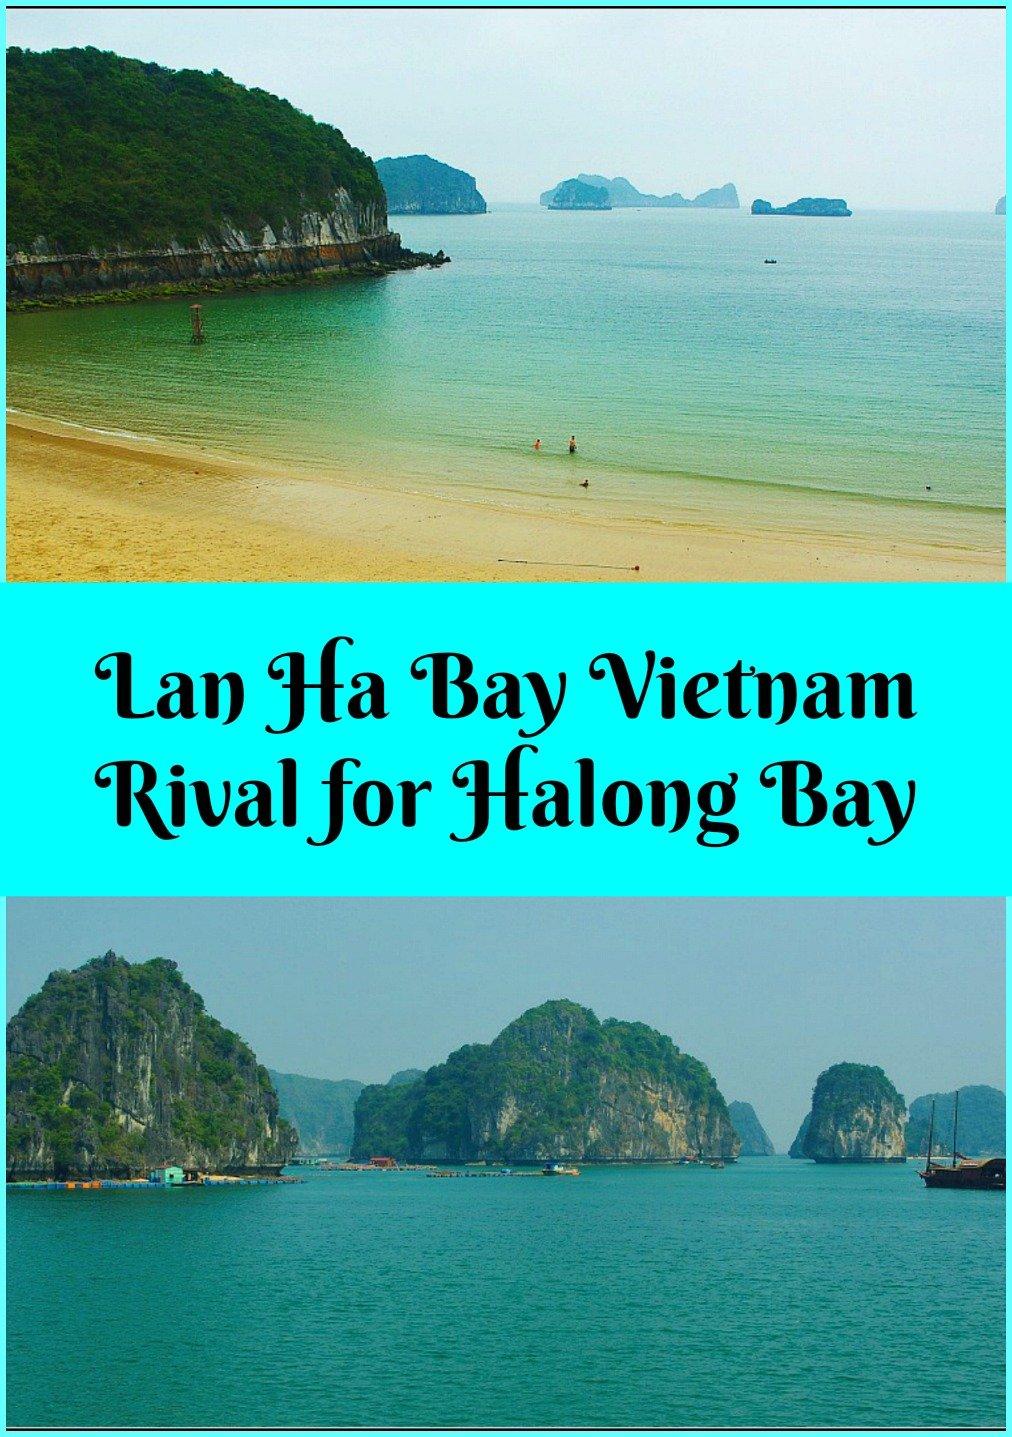 Lan Ha Bay Vietnam rival for Halong Bay